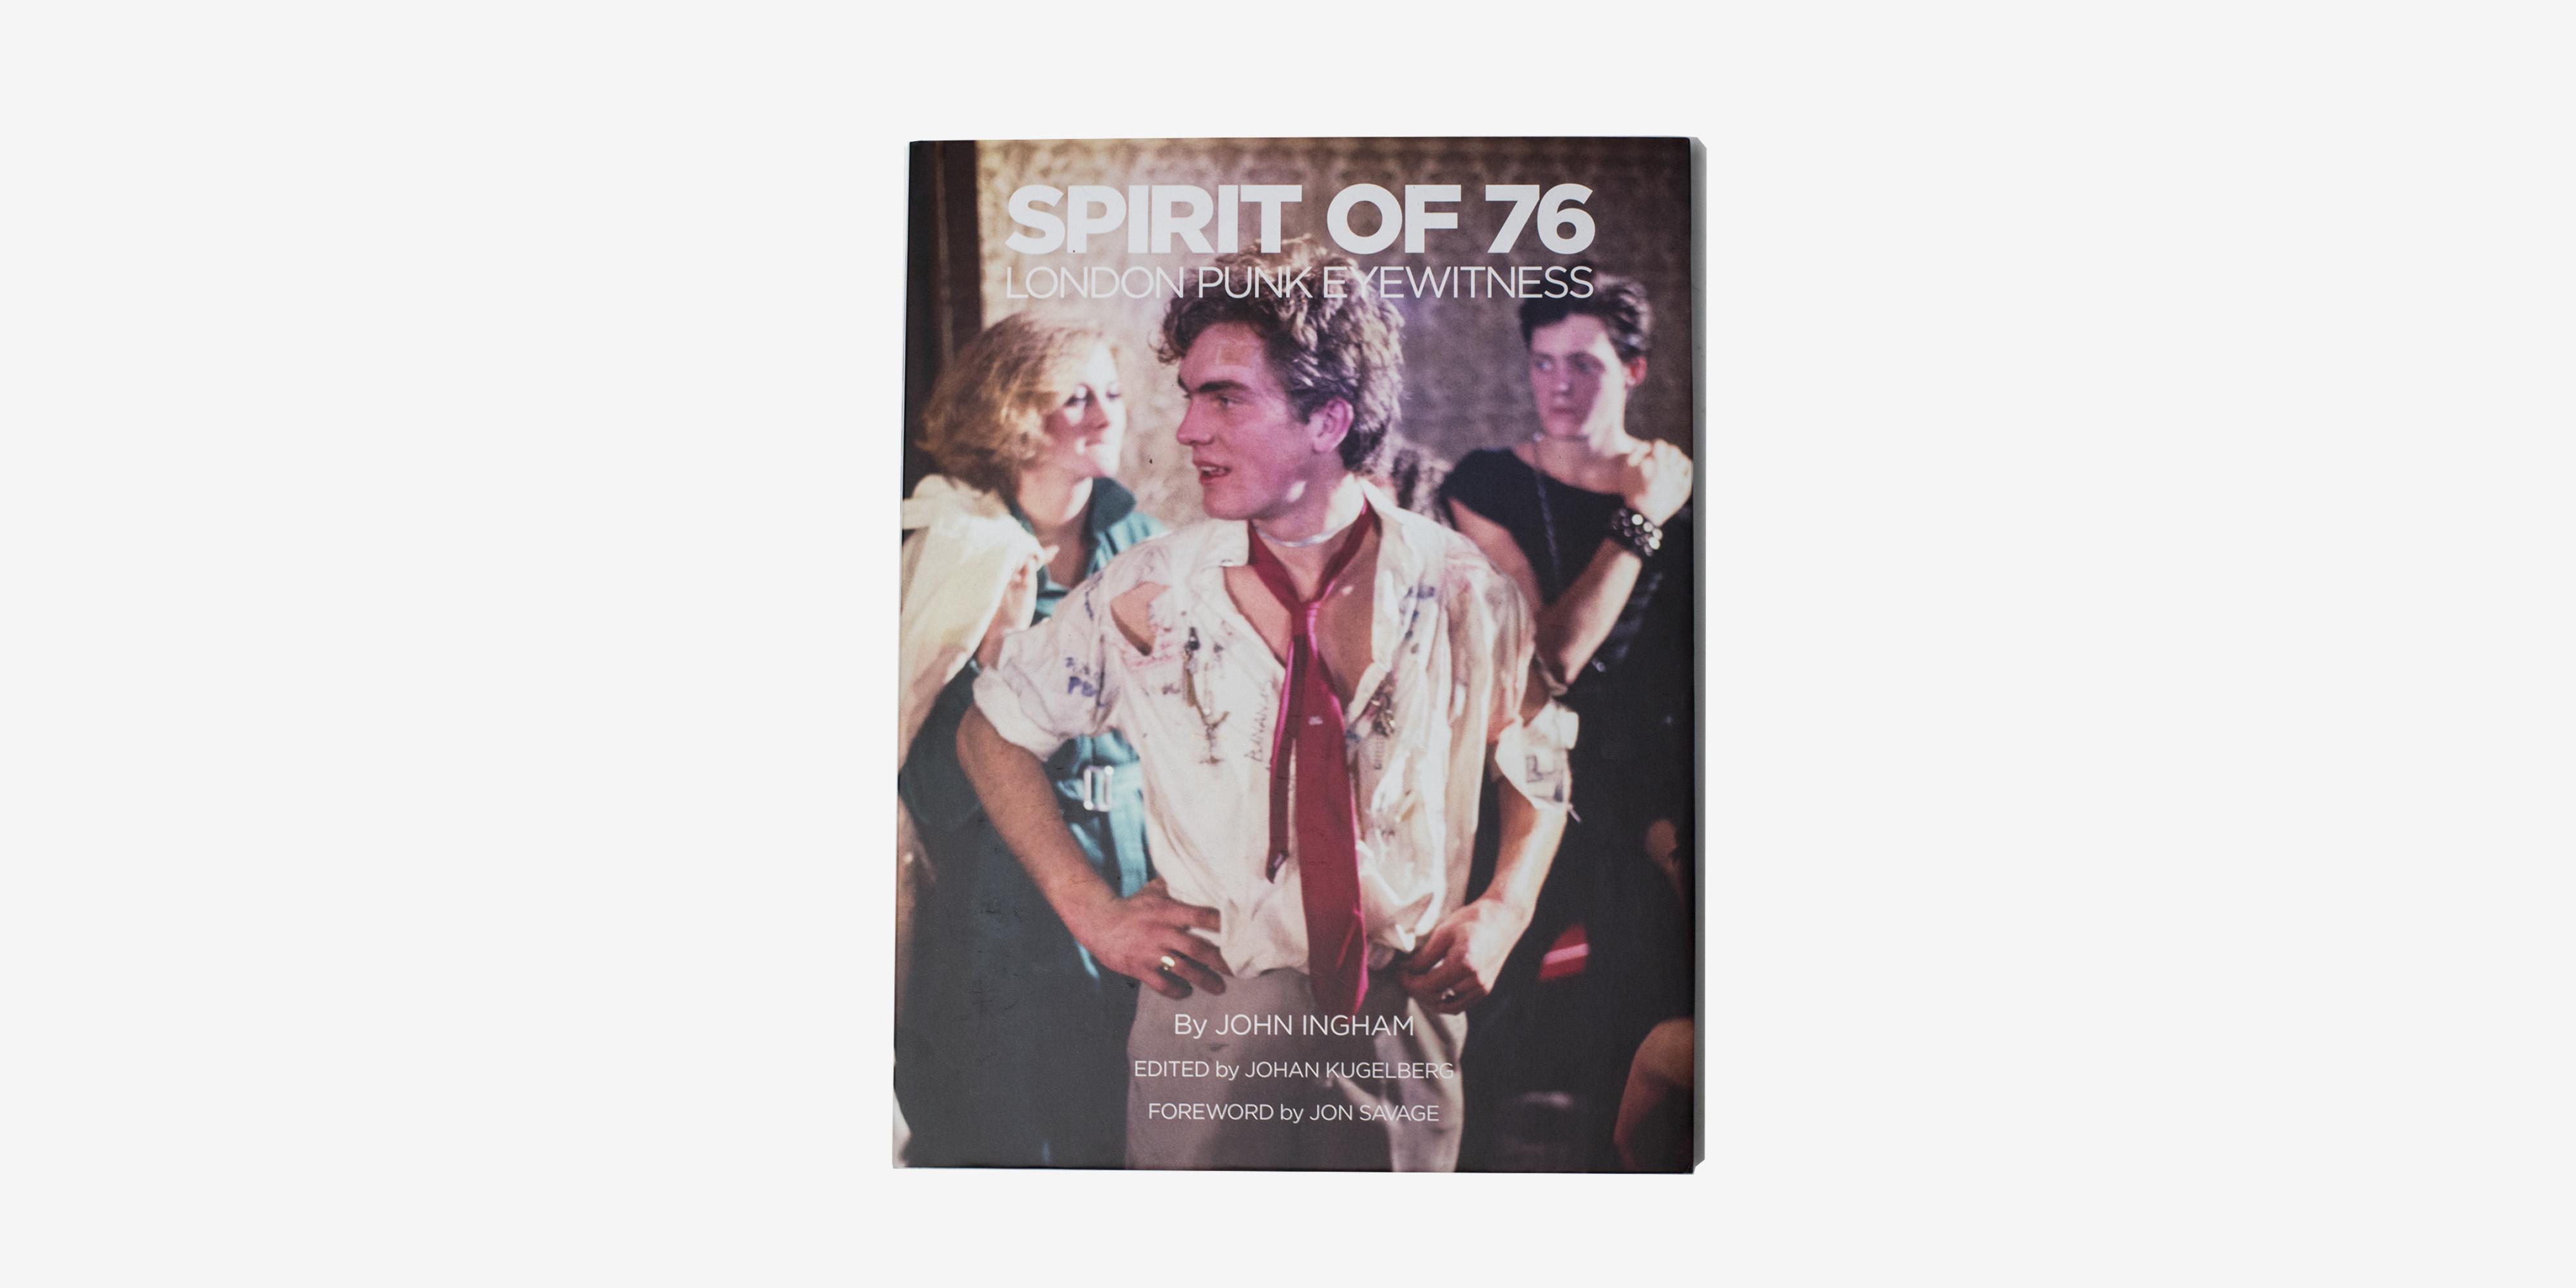 SPIRIT OF 76